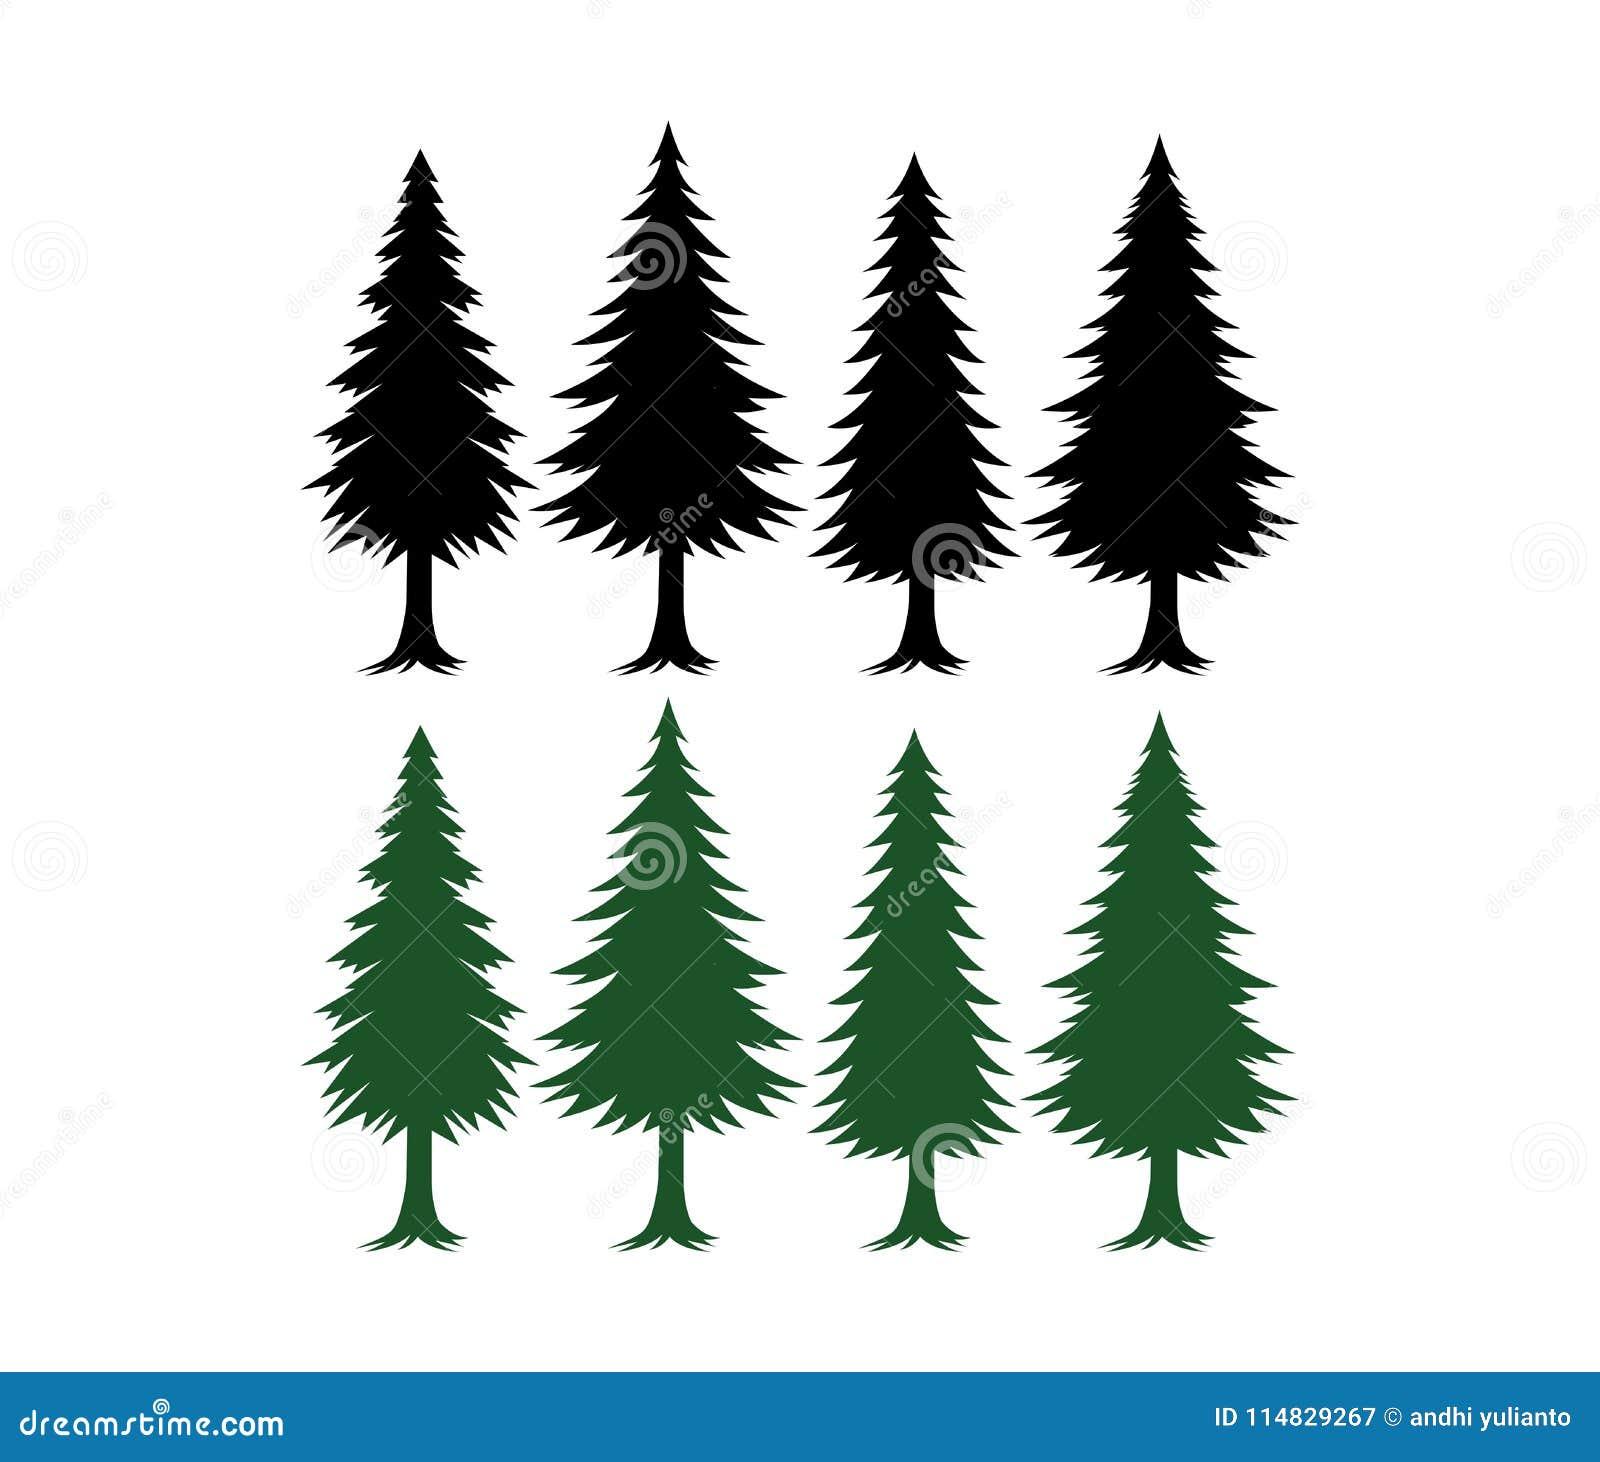 big pine tree with cartoon owl royalty